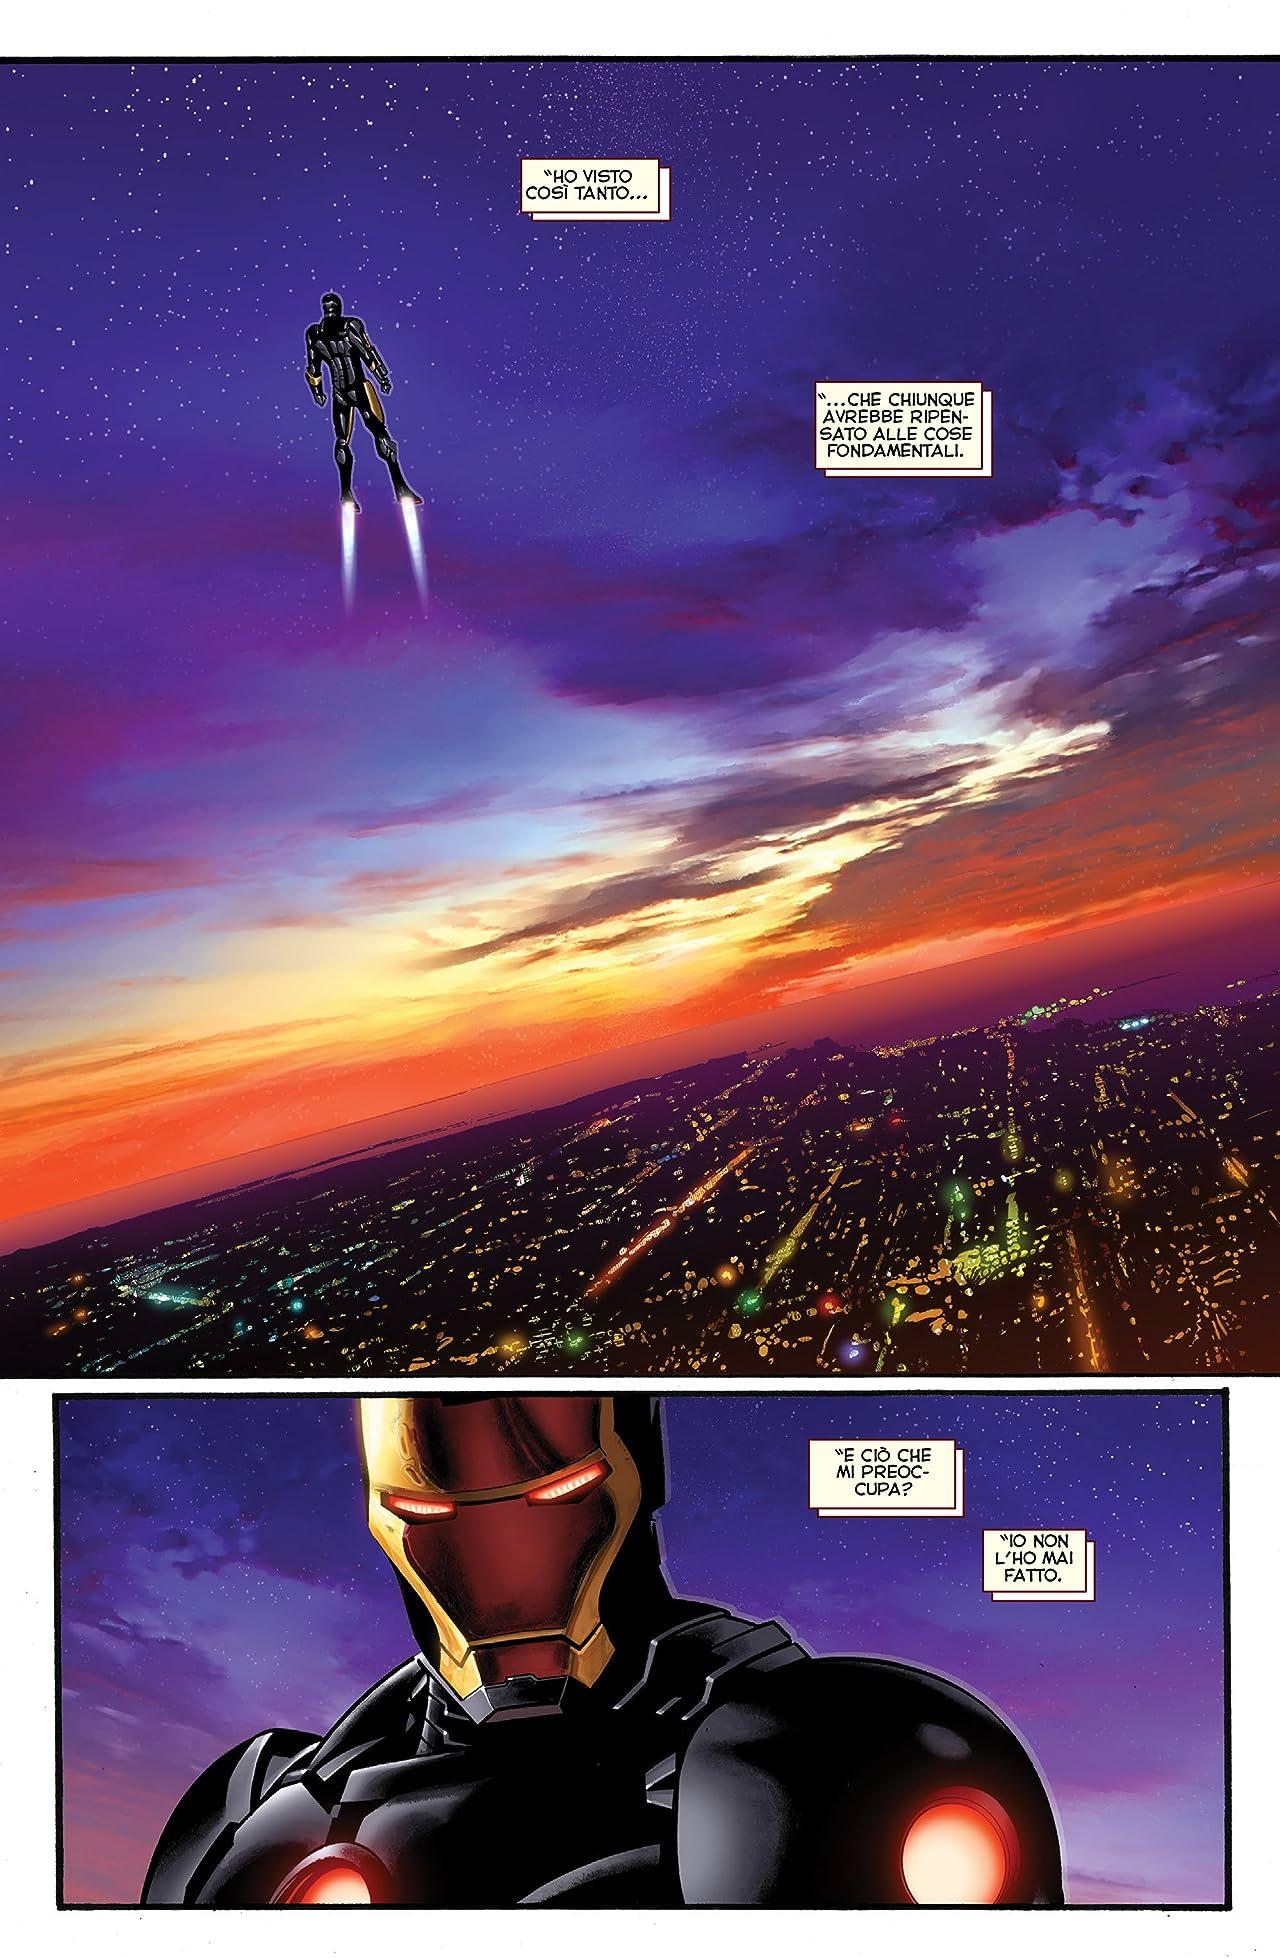 Iron Man Vol. 1: Credere